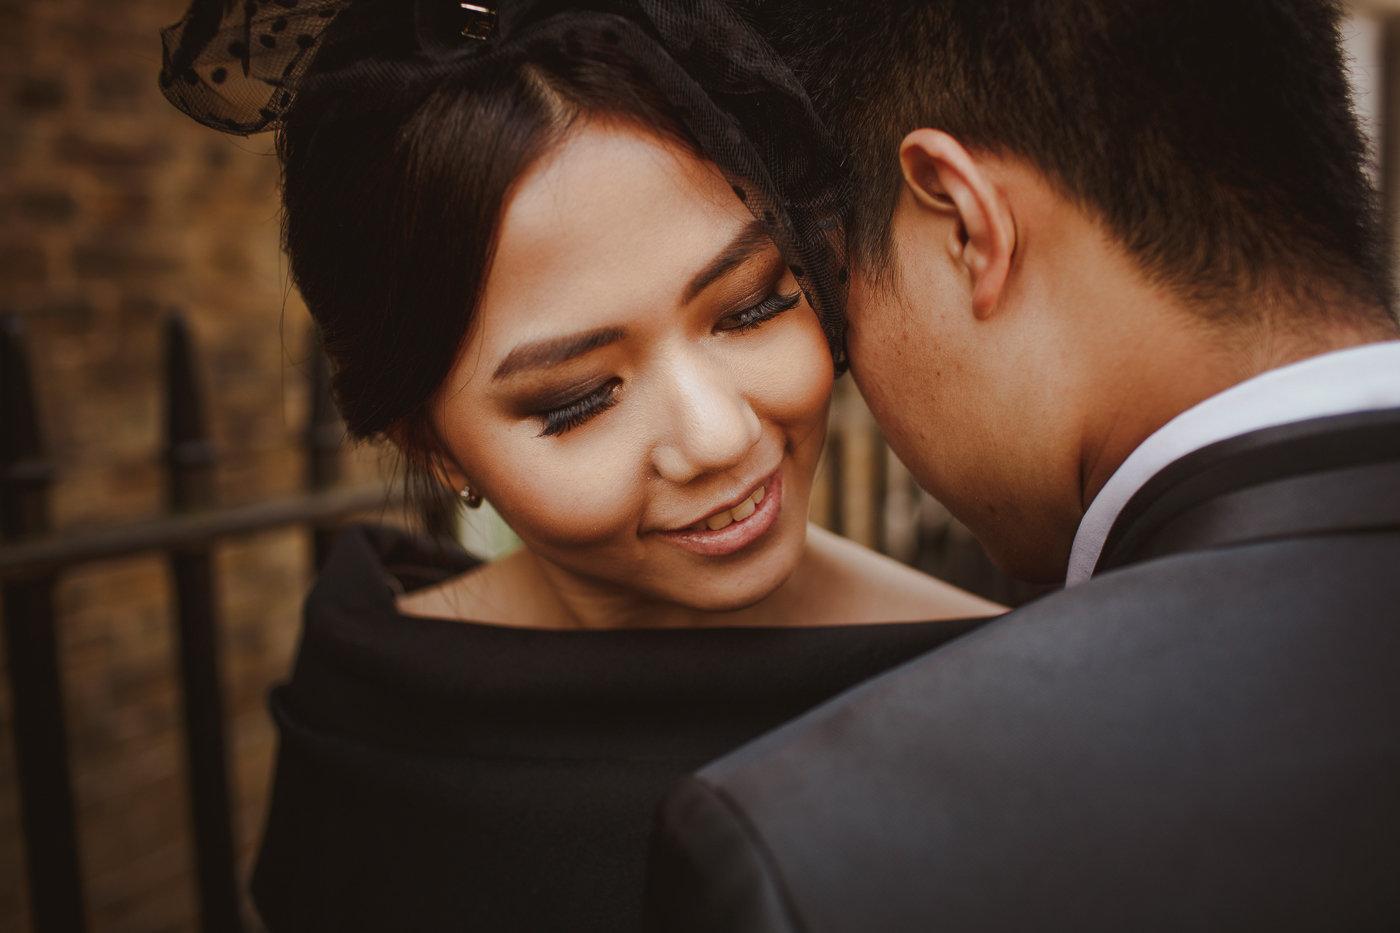 pre-wedding-photography-london-3.jpg